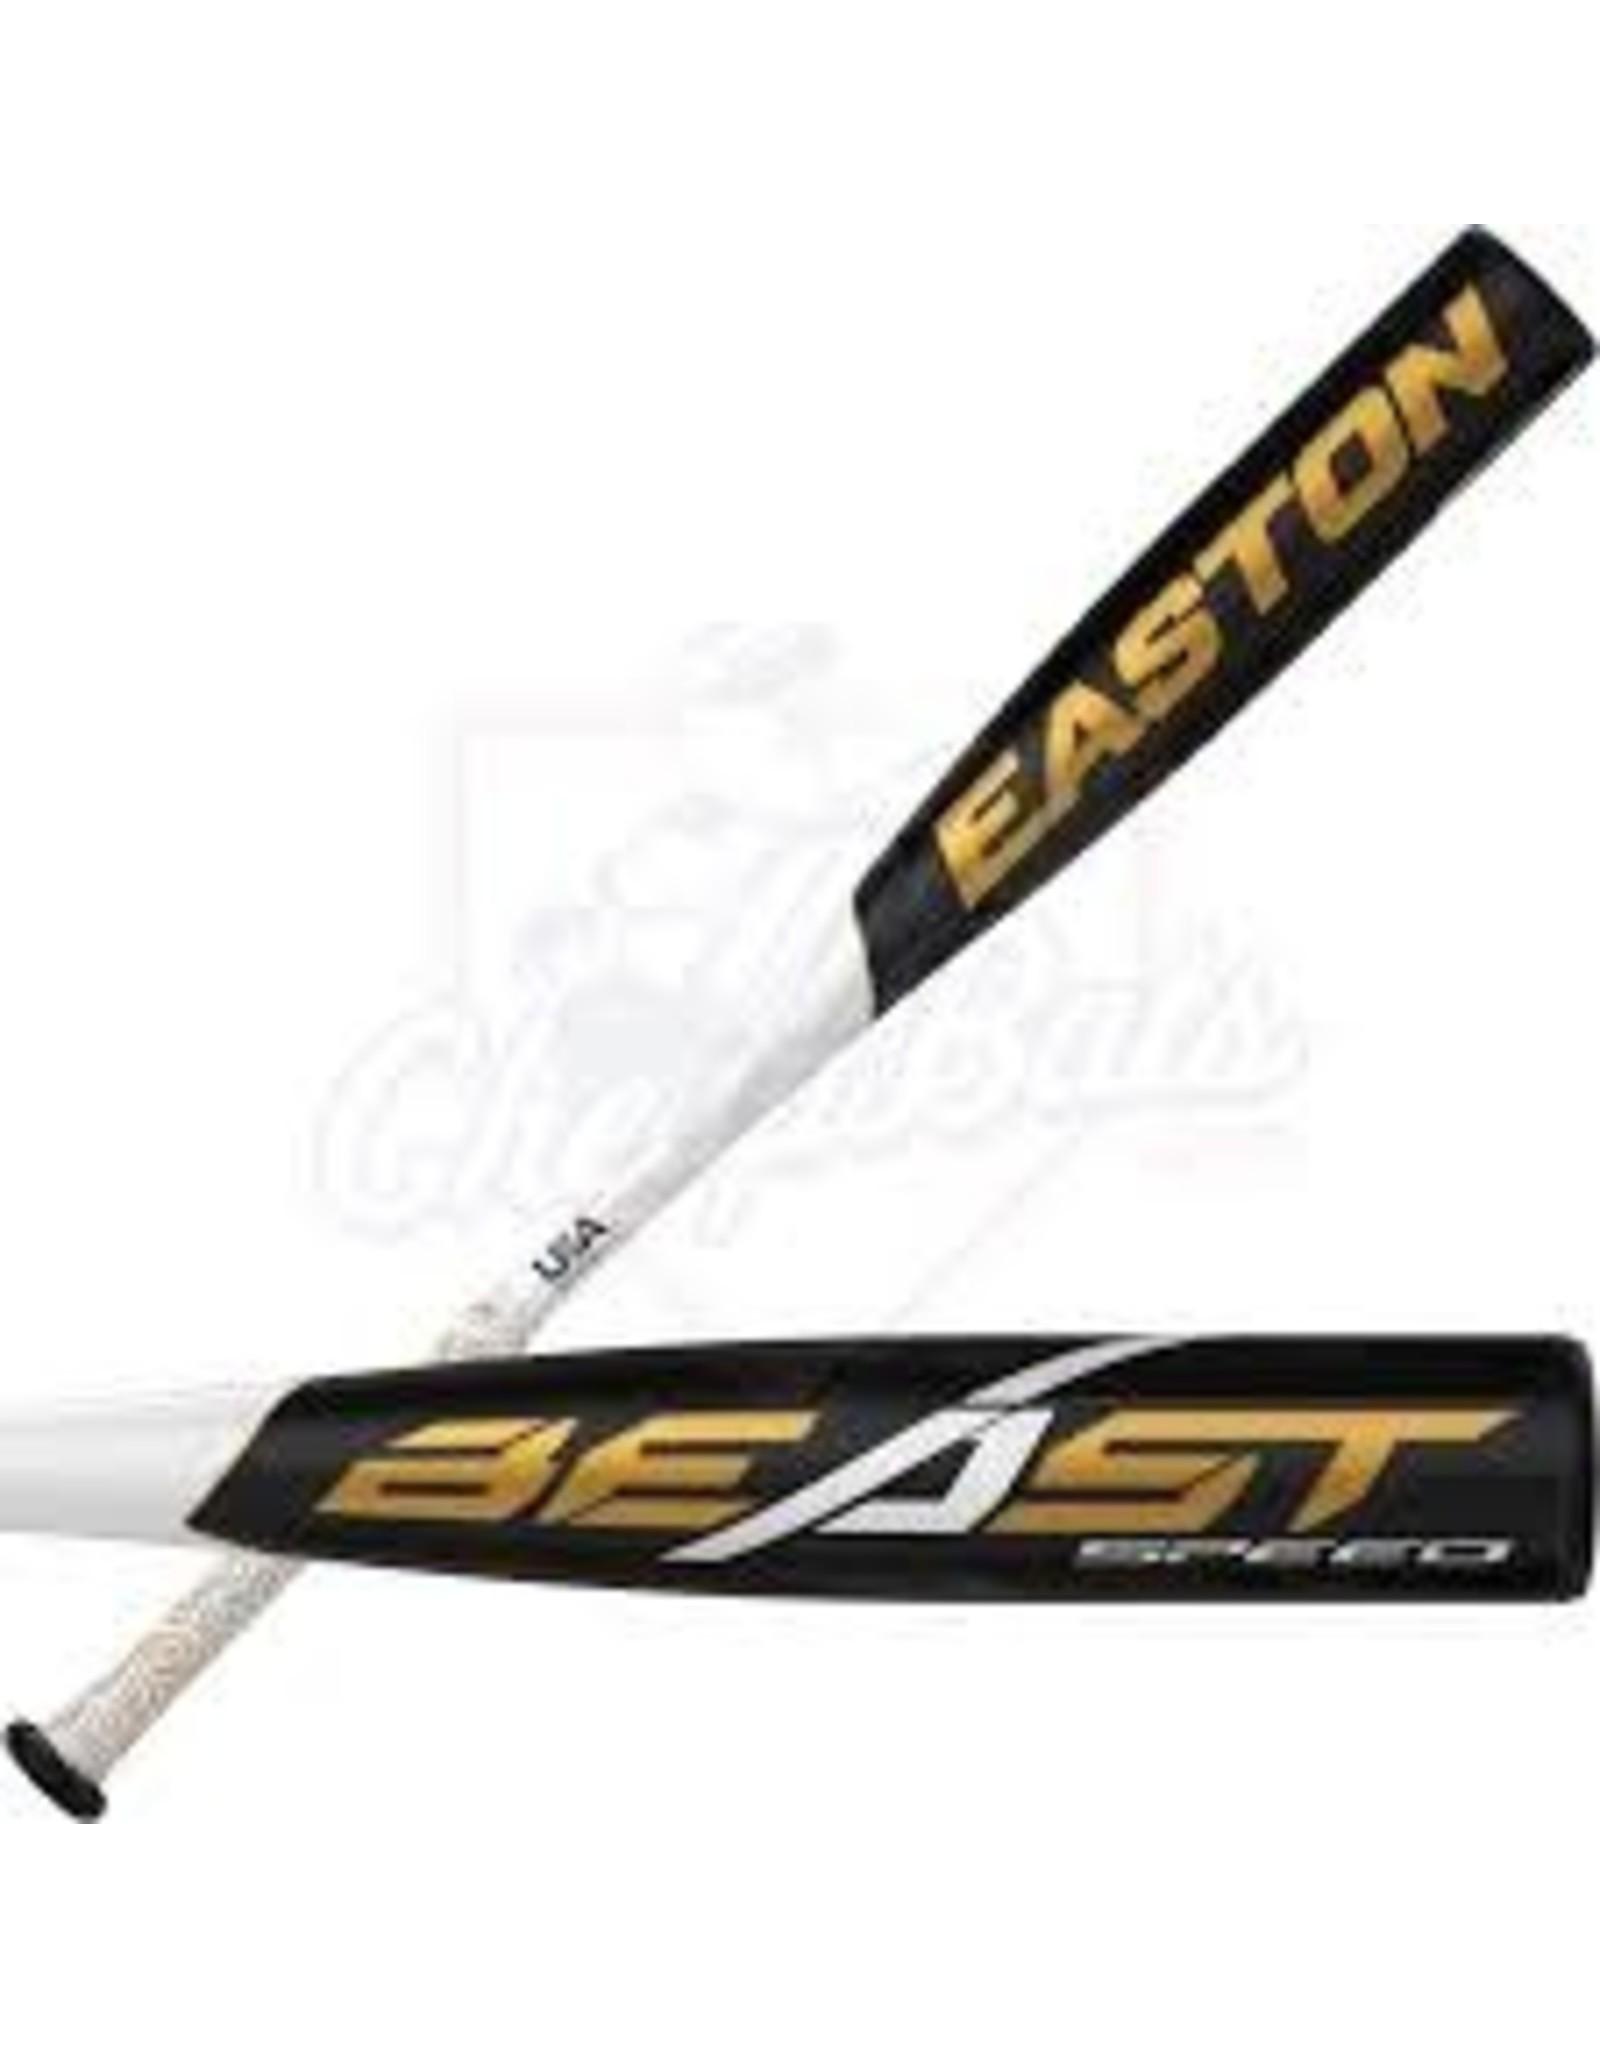 Easton - Beast Speed 2 5/8 29-10